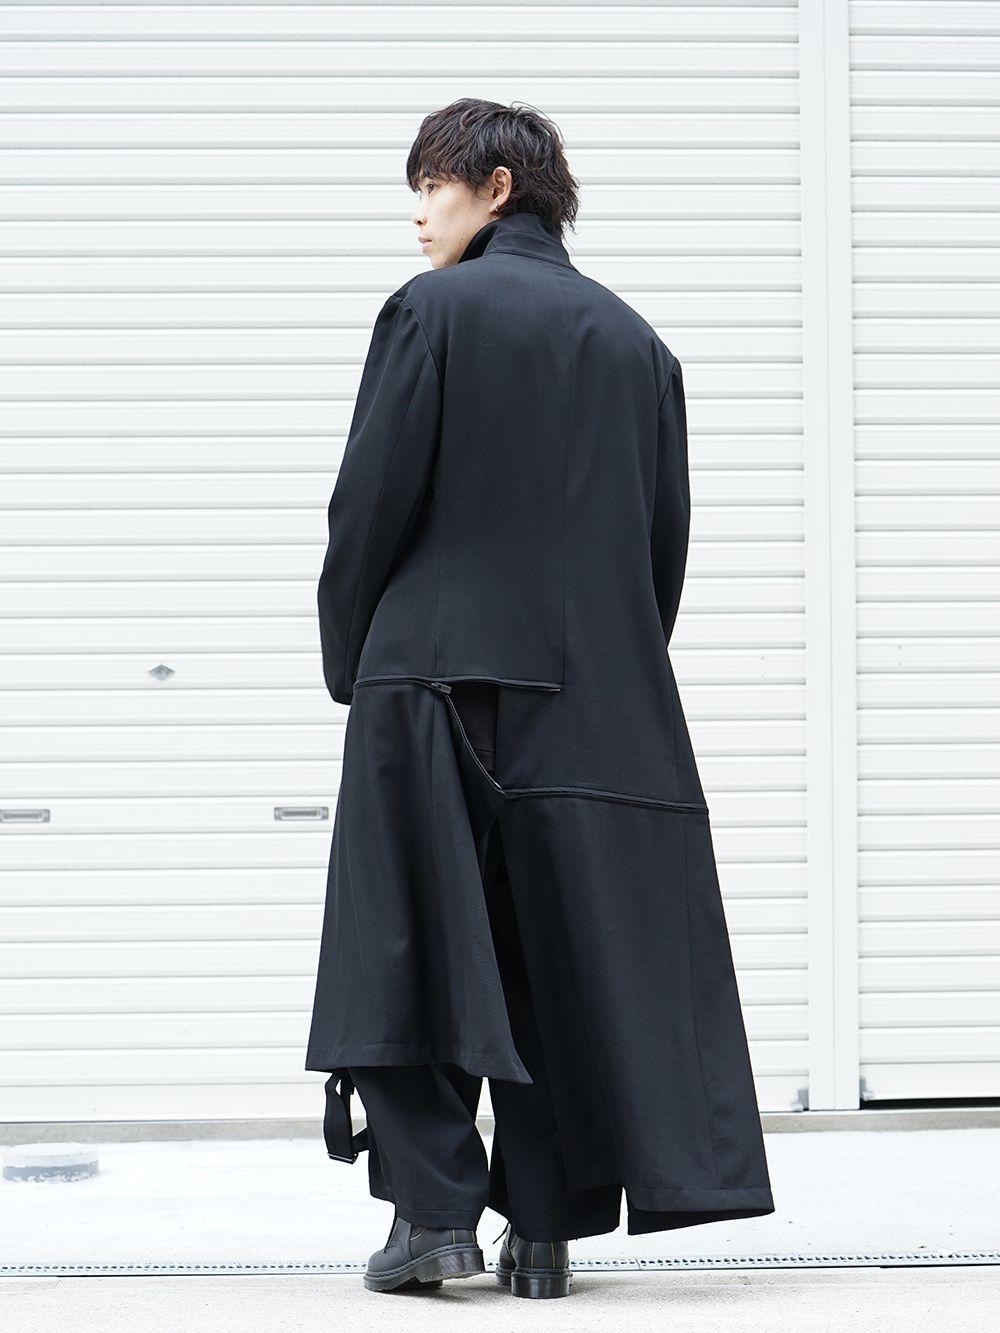 Yohji Yamamoto 19-20AW New Arrival - 1-003